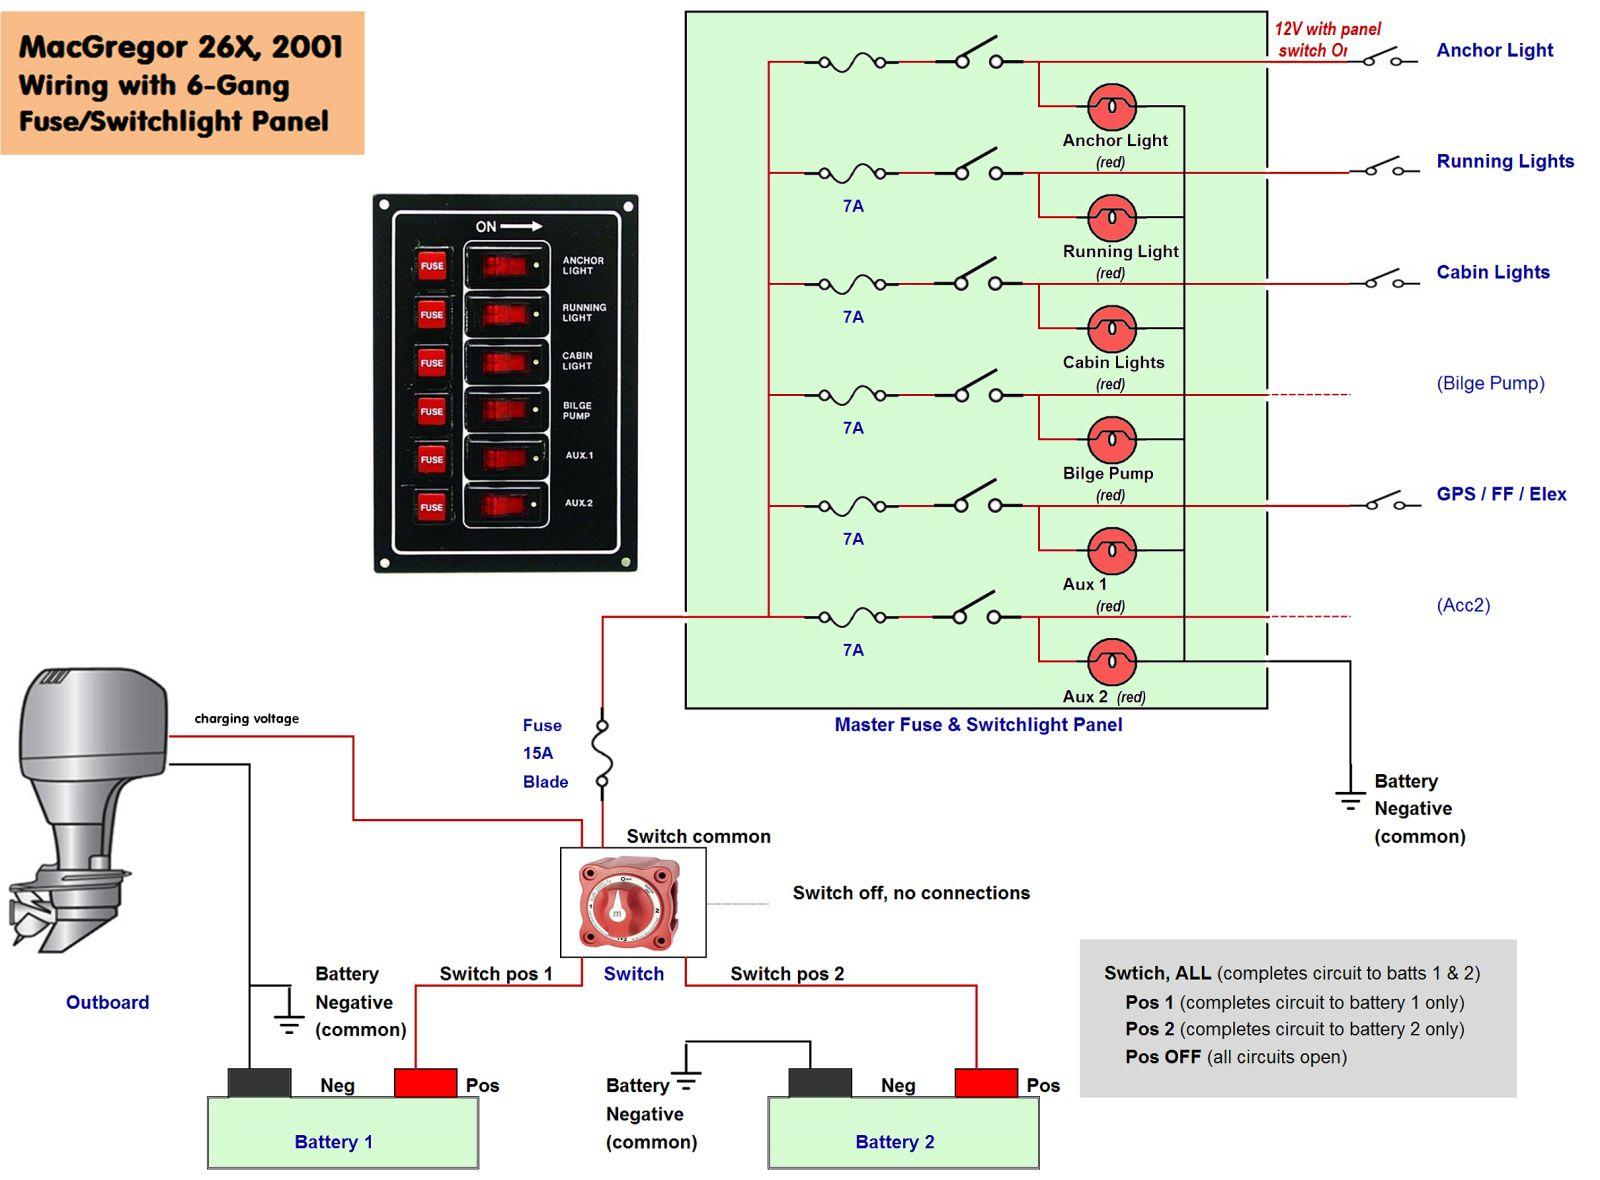 Boat Wiring Diagram | Boat | Boat Wiring, Boat, Boat Plans - Basic 12 Volt Boat Wiring Diagram